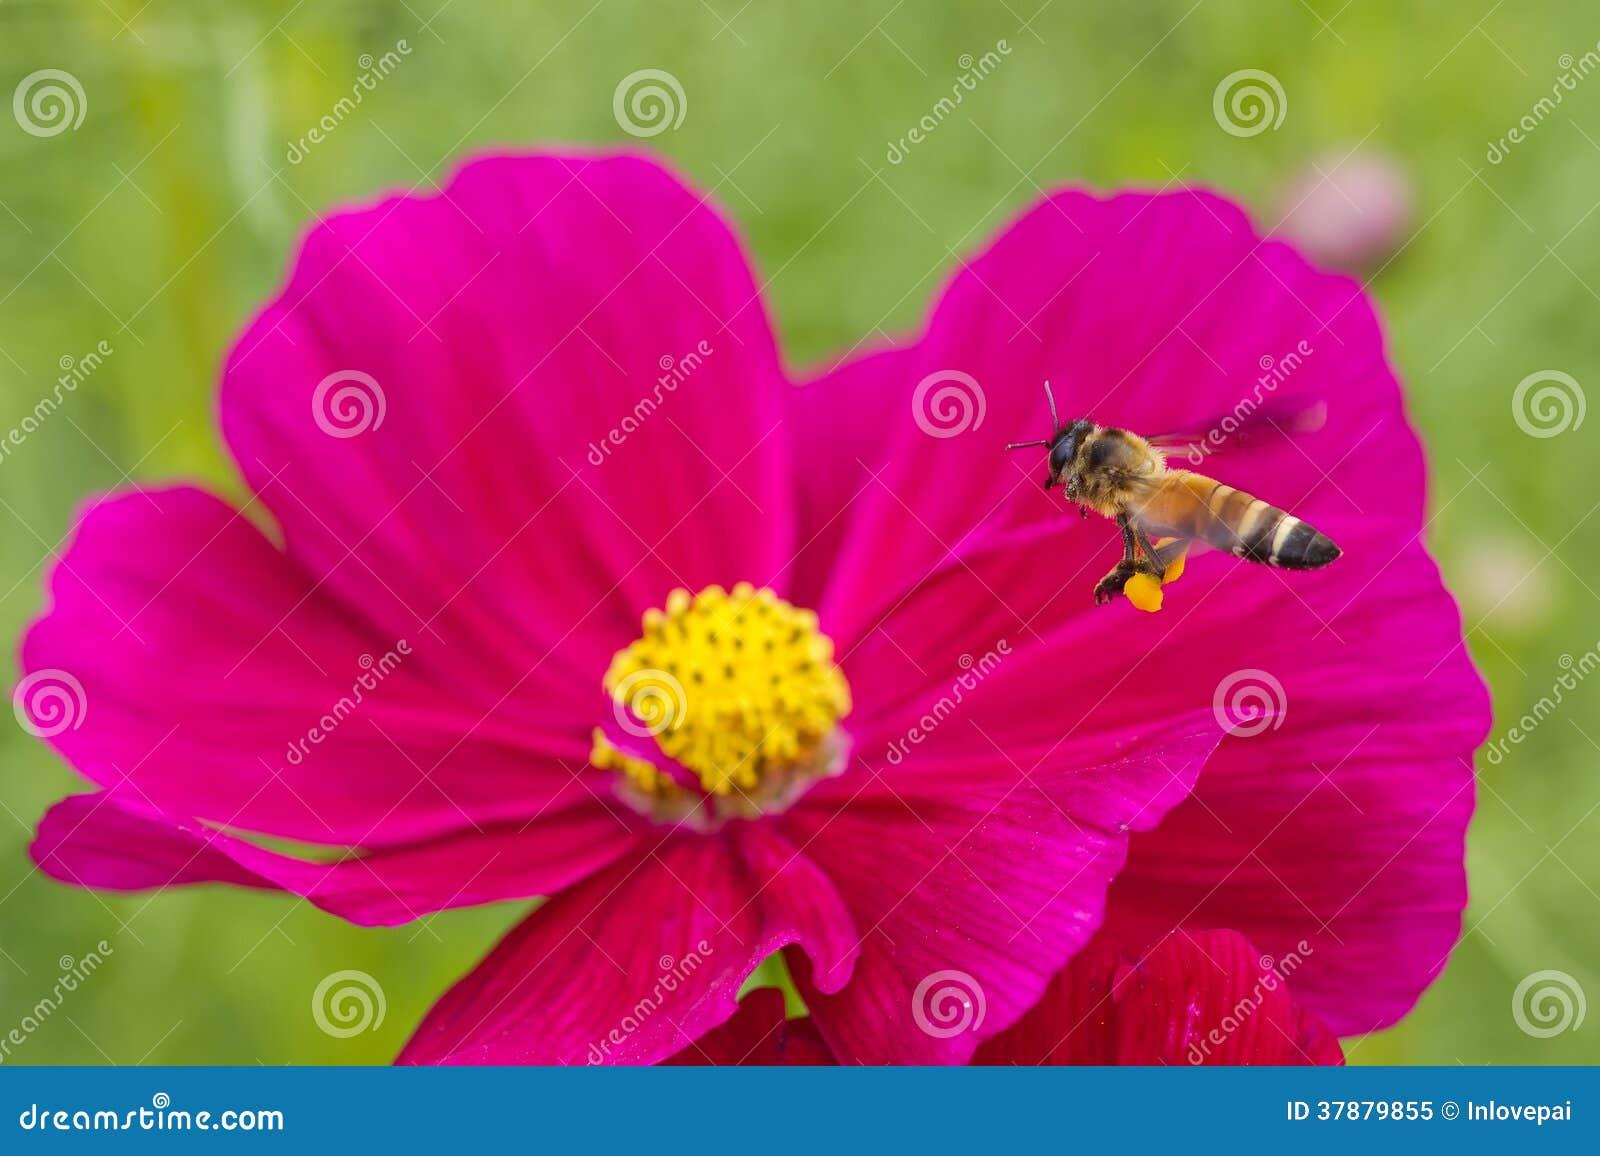 Abeja polinizada de la flor roja